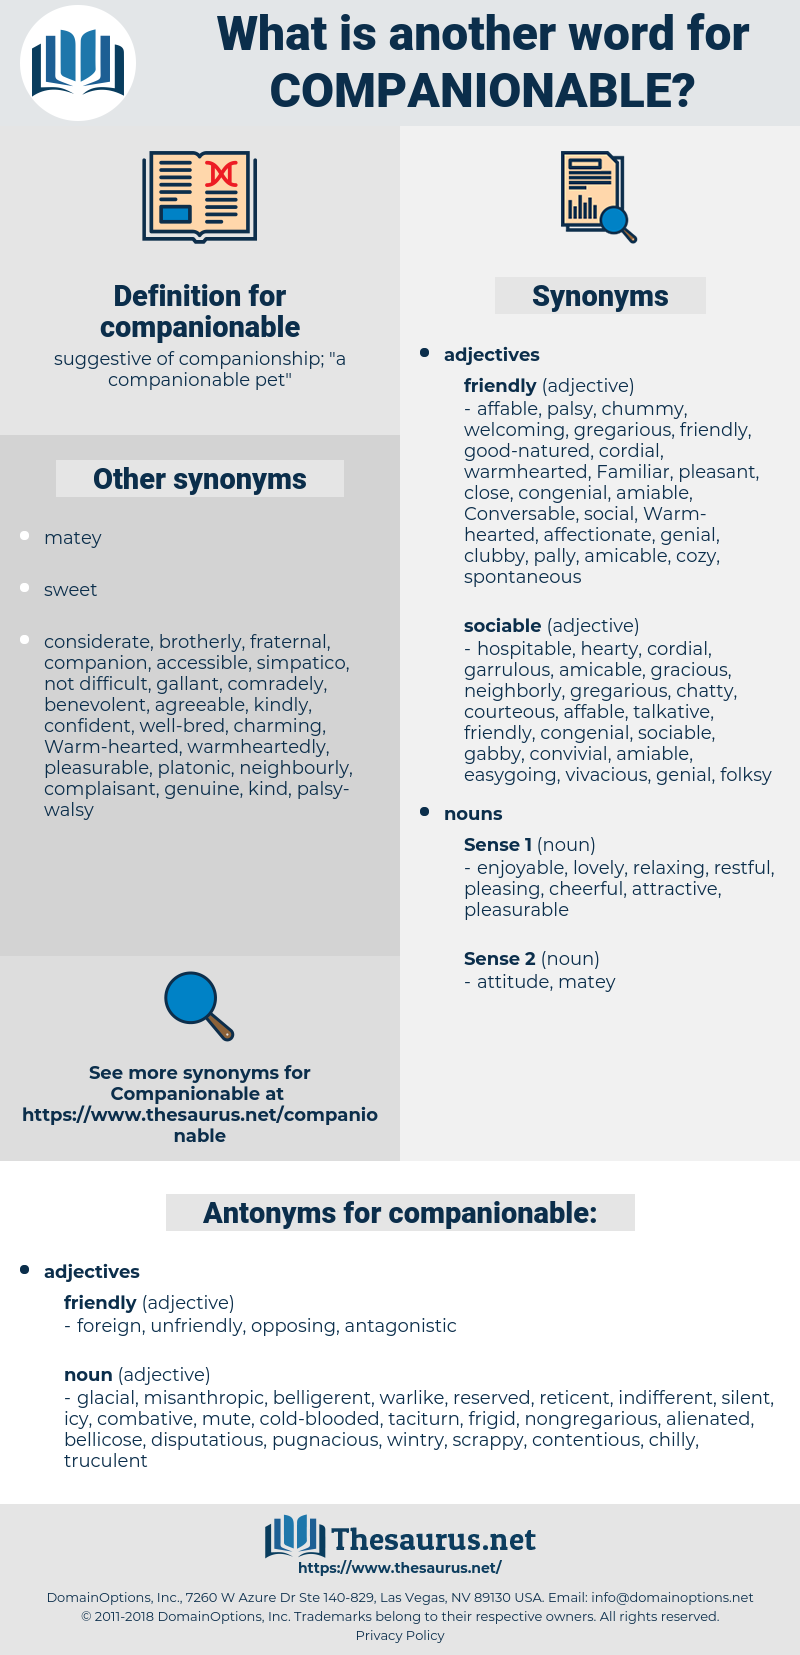 companionable, synonym companionable, another word for companionable, words like companionable, thesaurus companionable